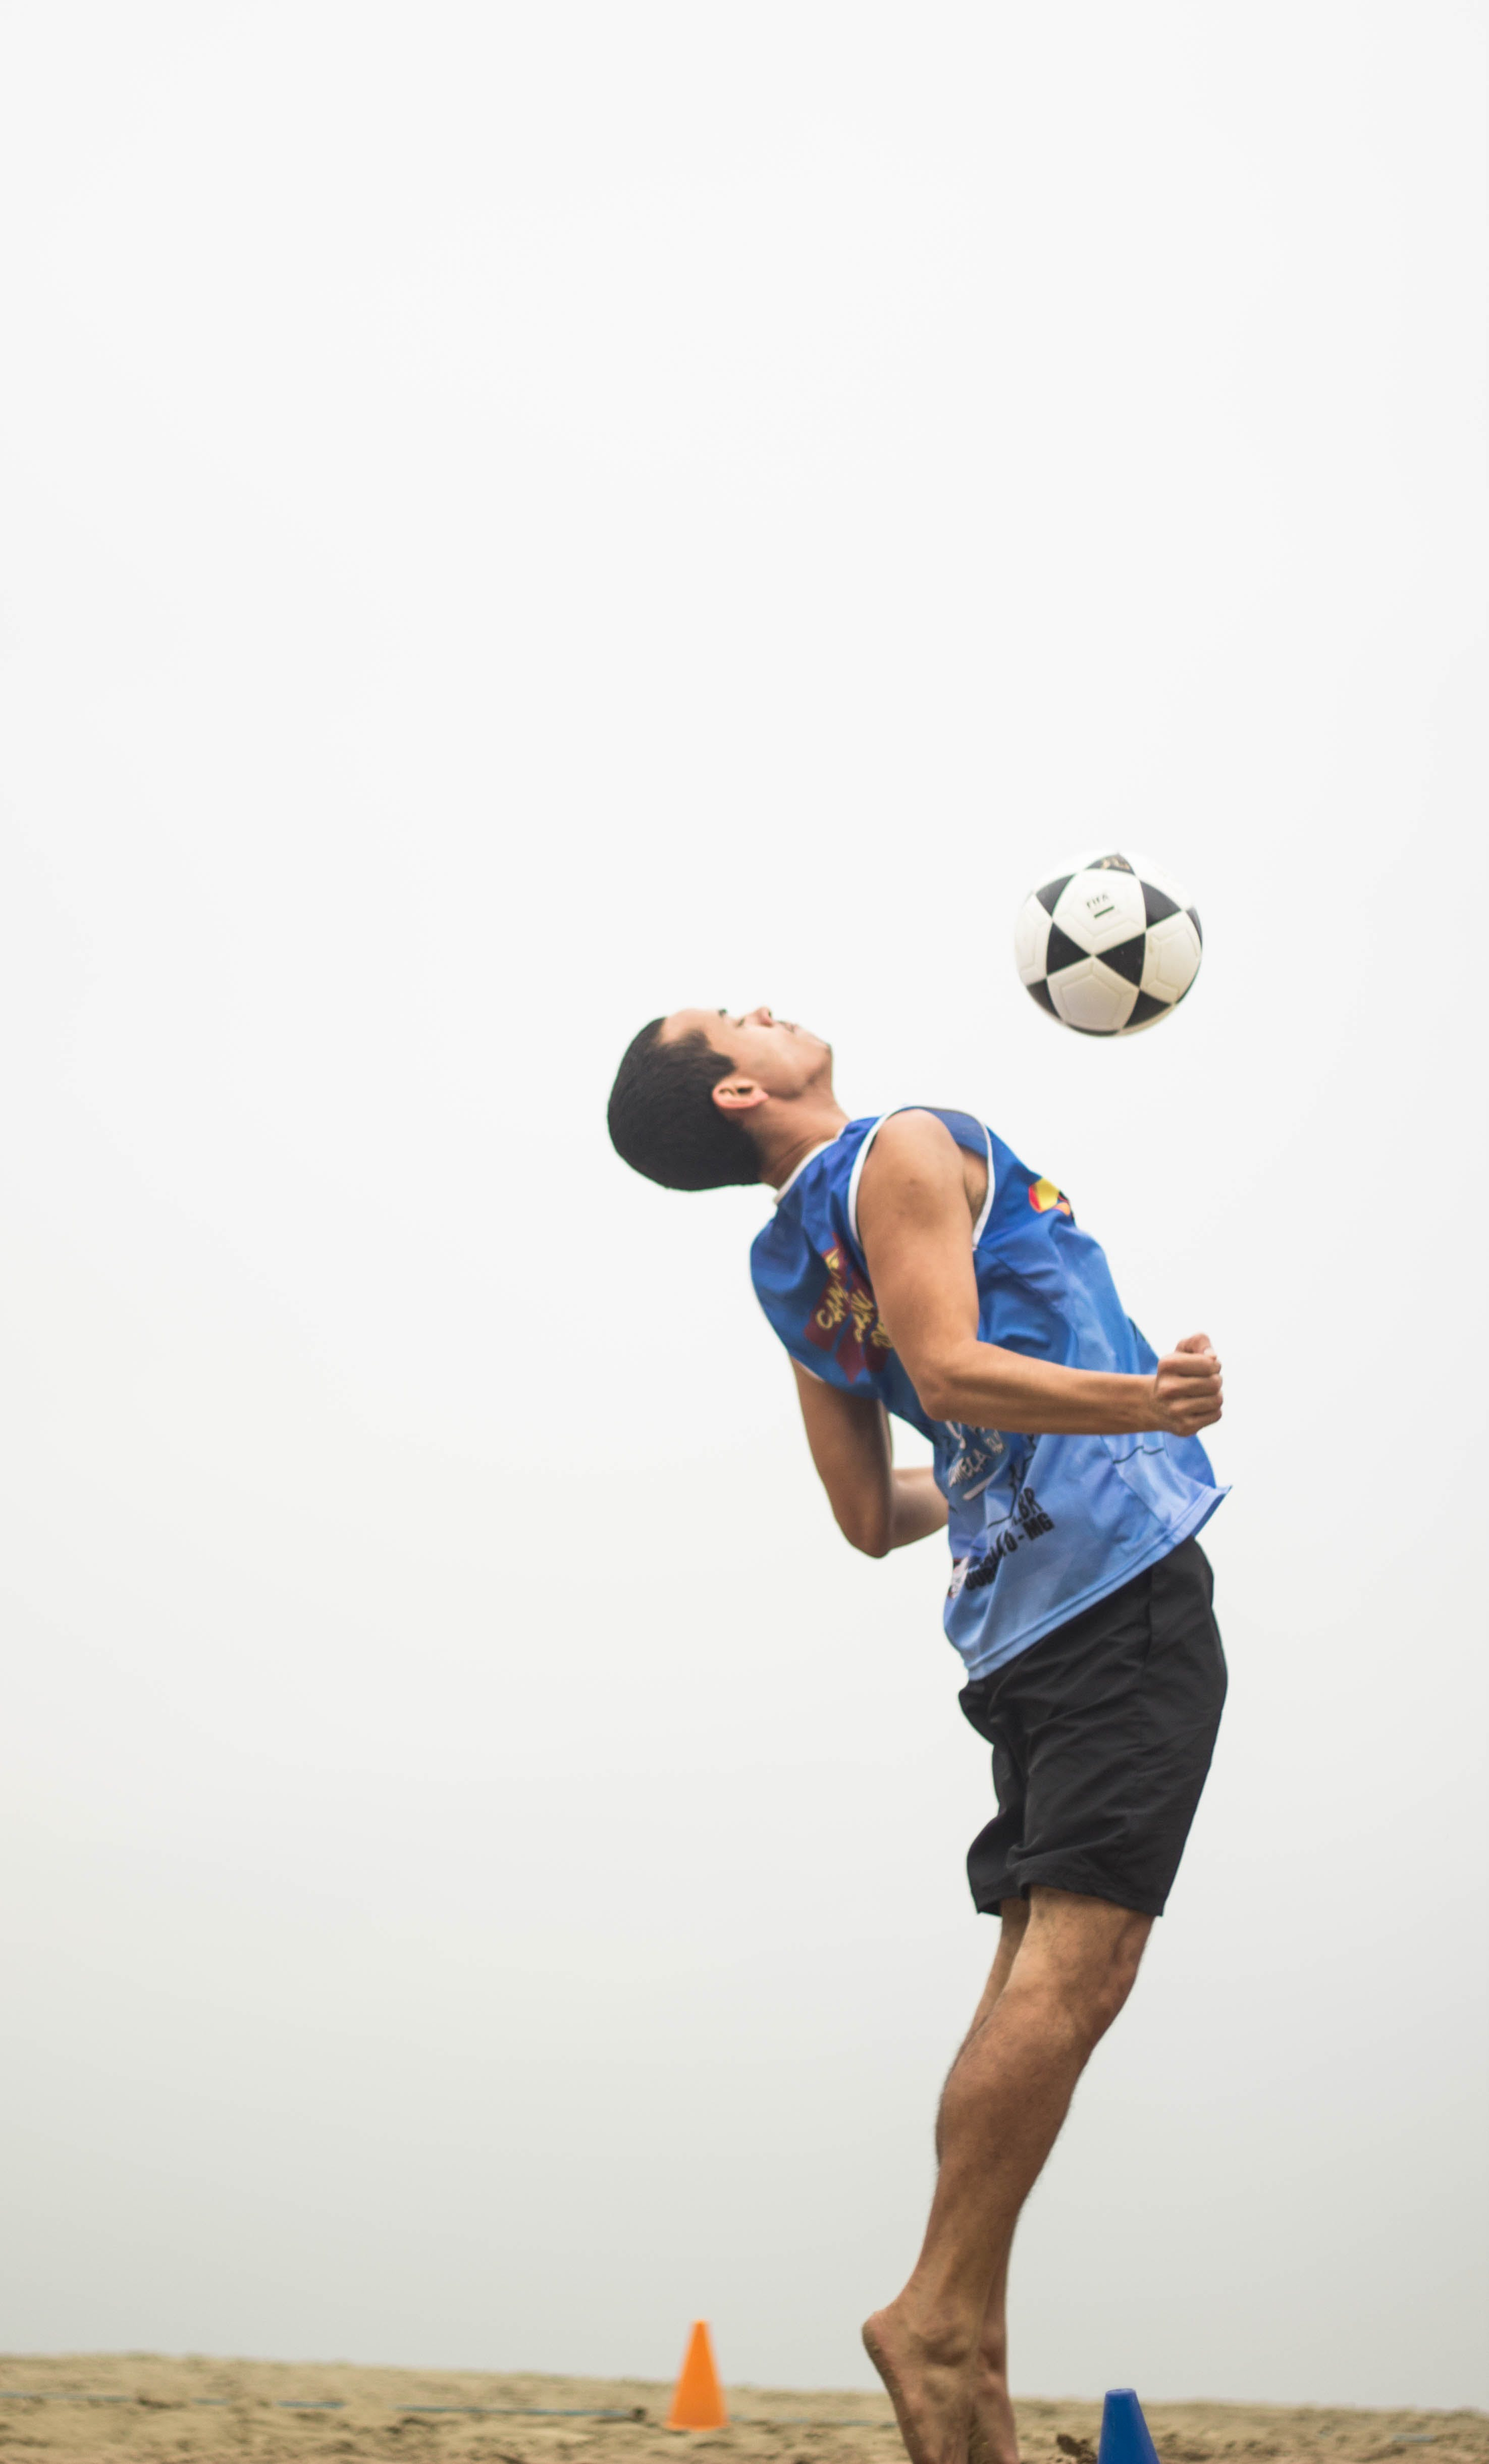 Man Playing Soccer Ball